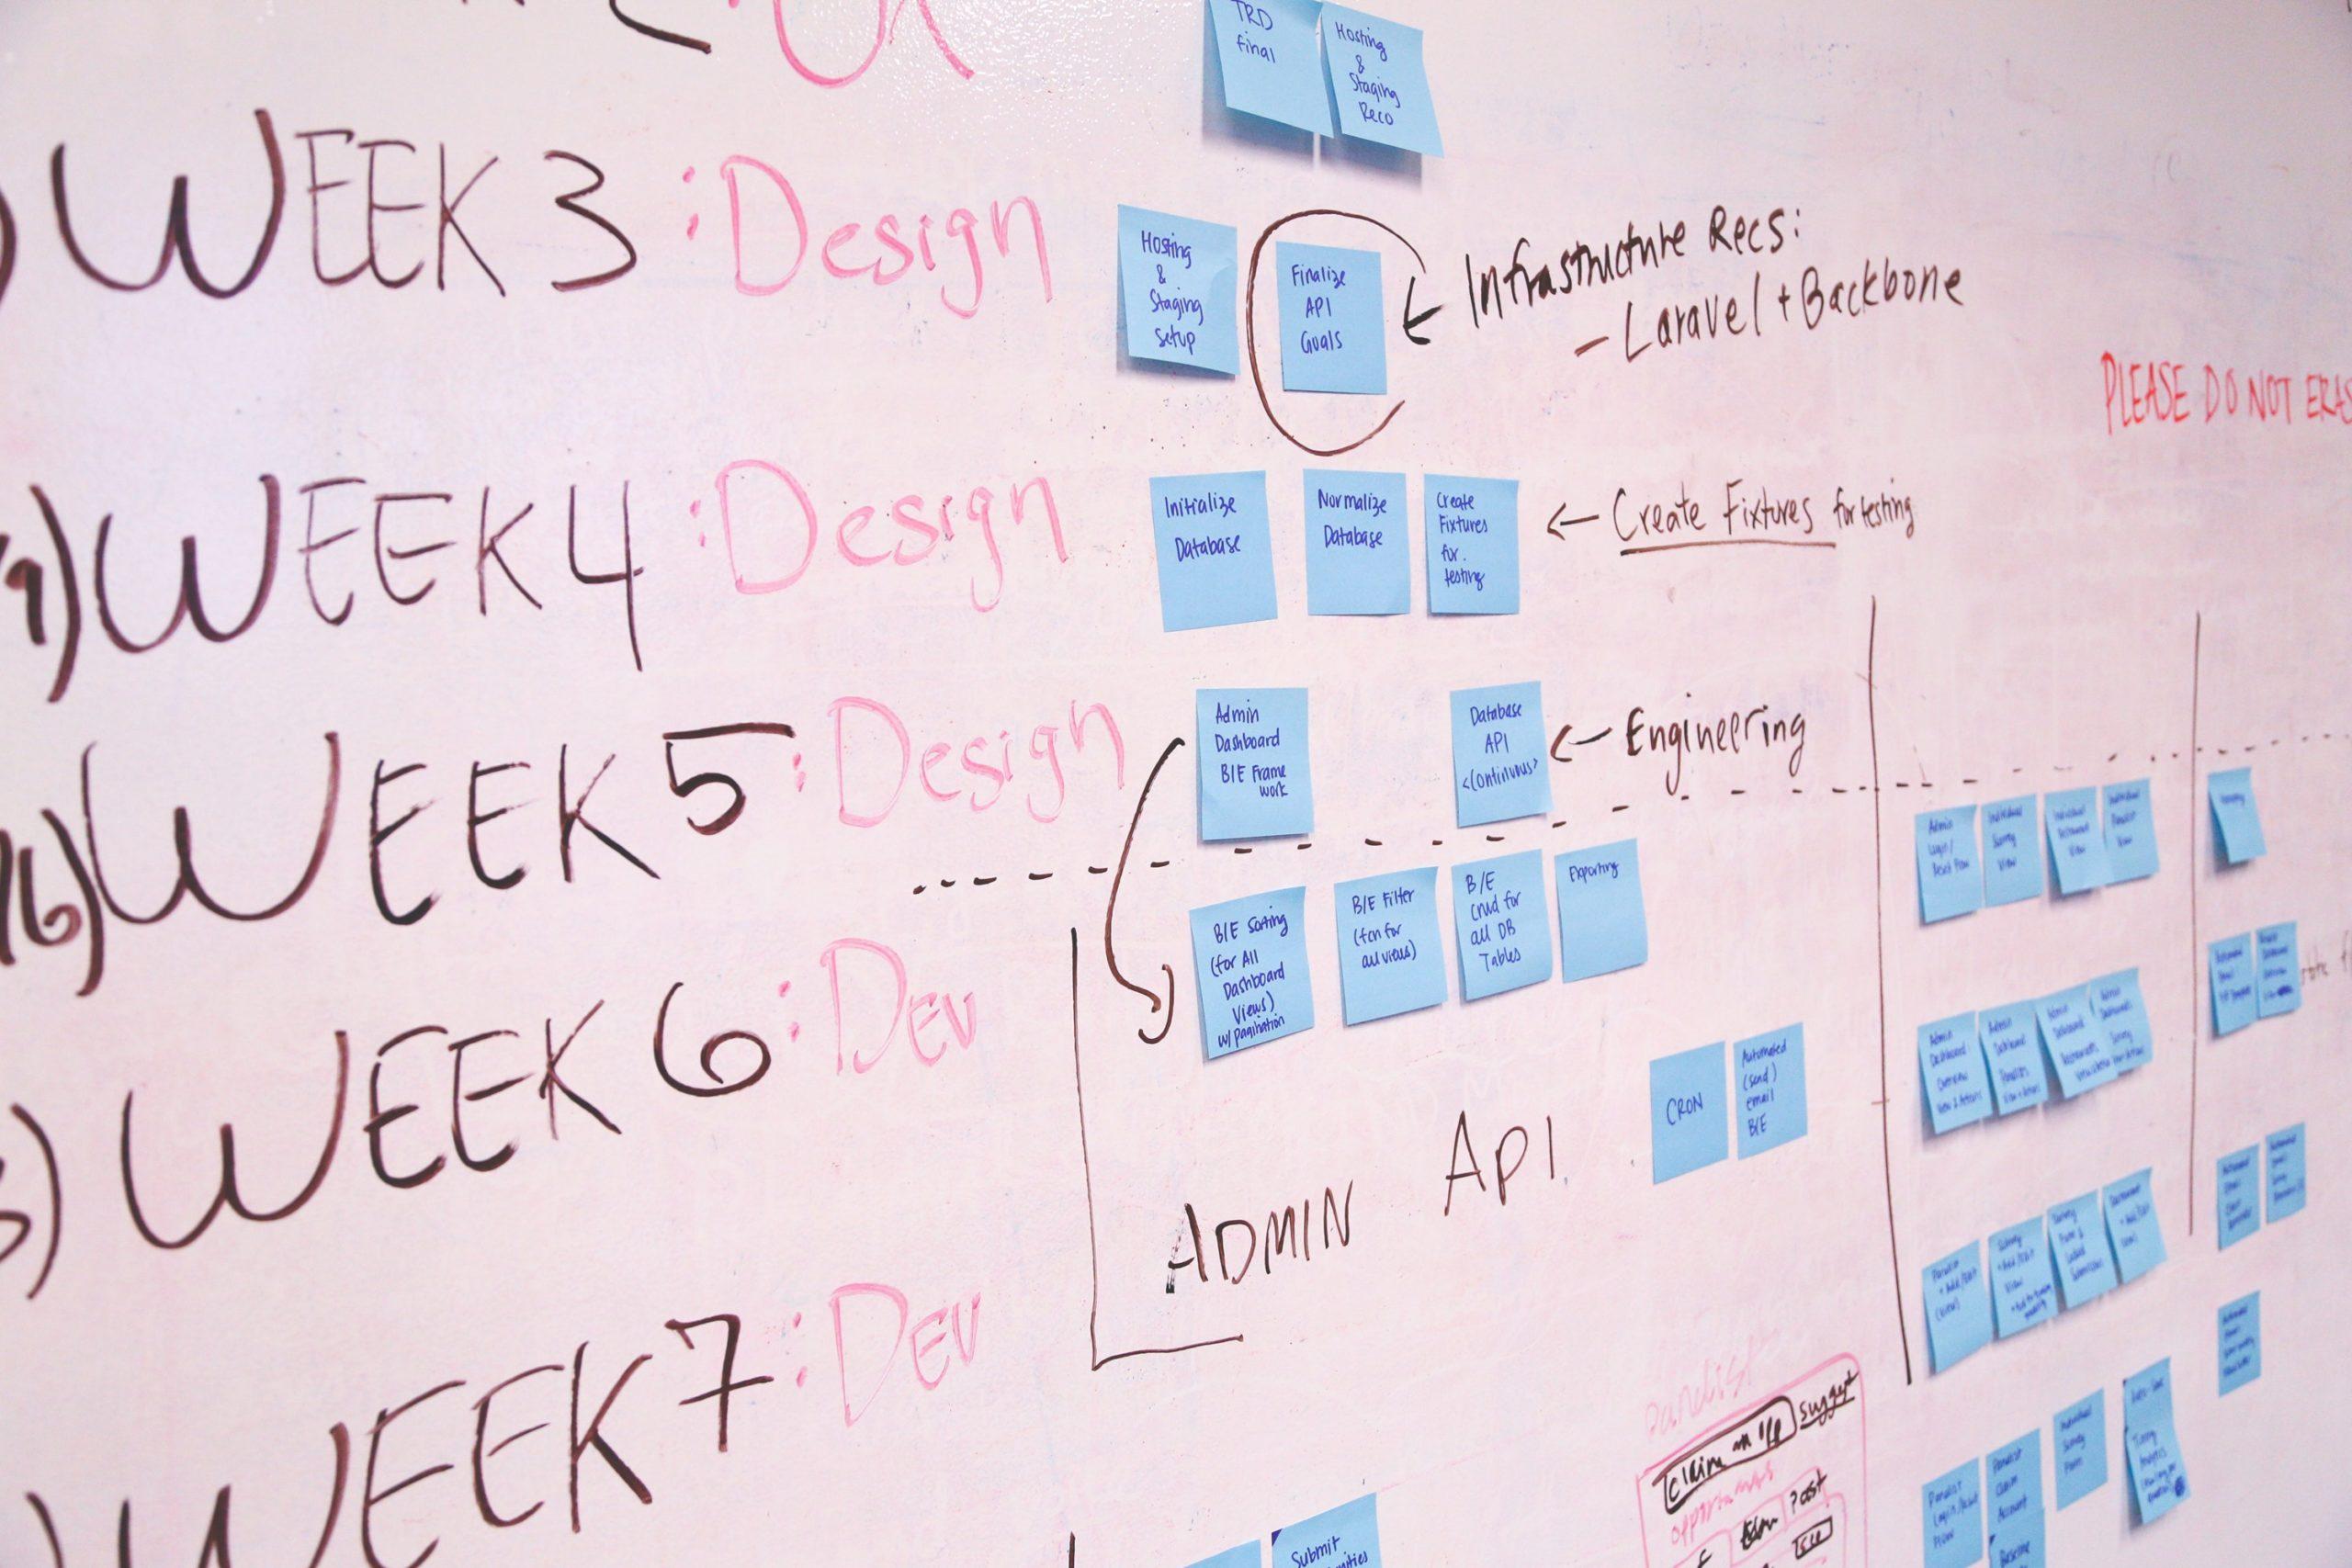 RAMS-Plan RAMS/LCC Projektmanagement Kalkulation Anforderungsmanagement Lebenszyklus Produktlebenszyklus V-Modell